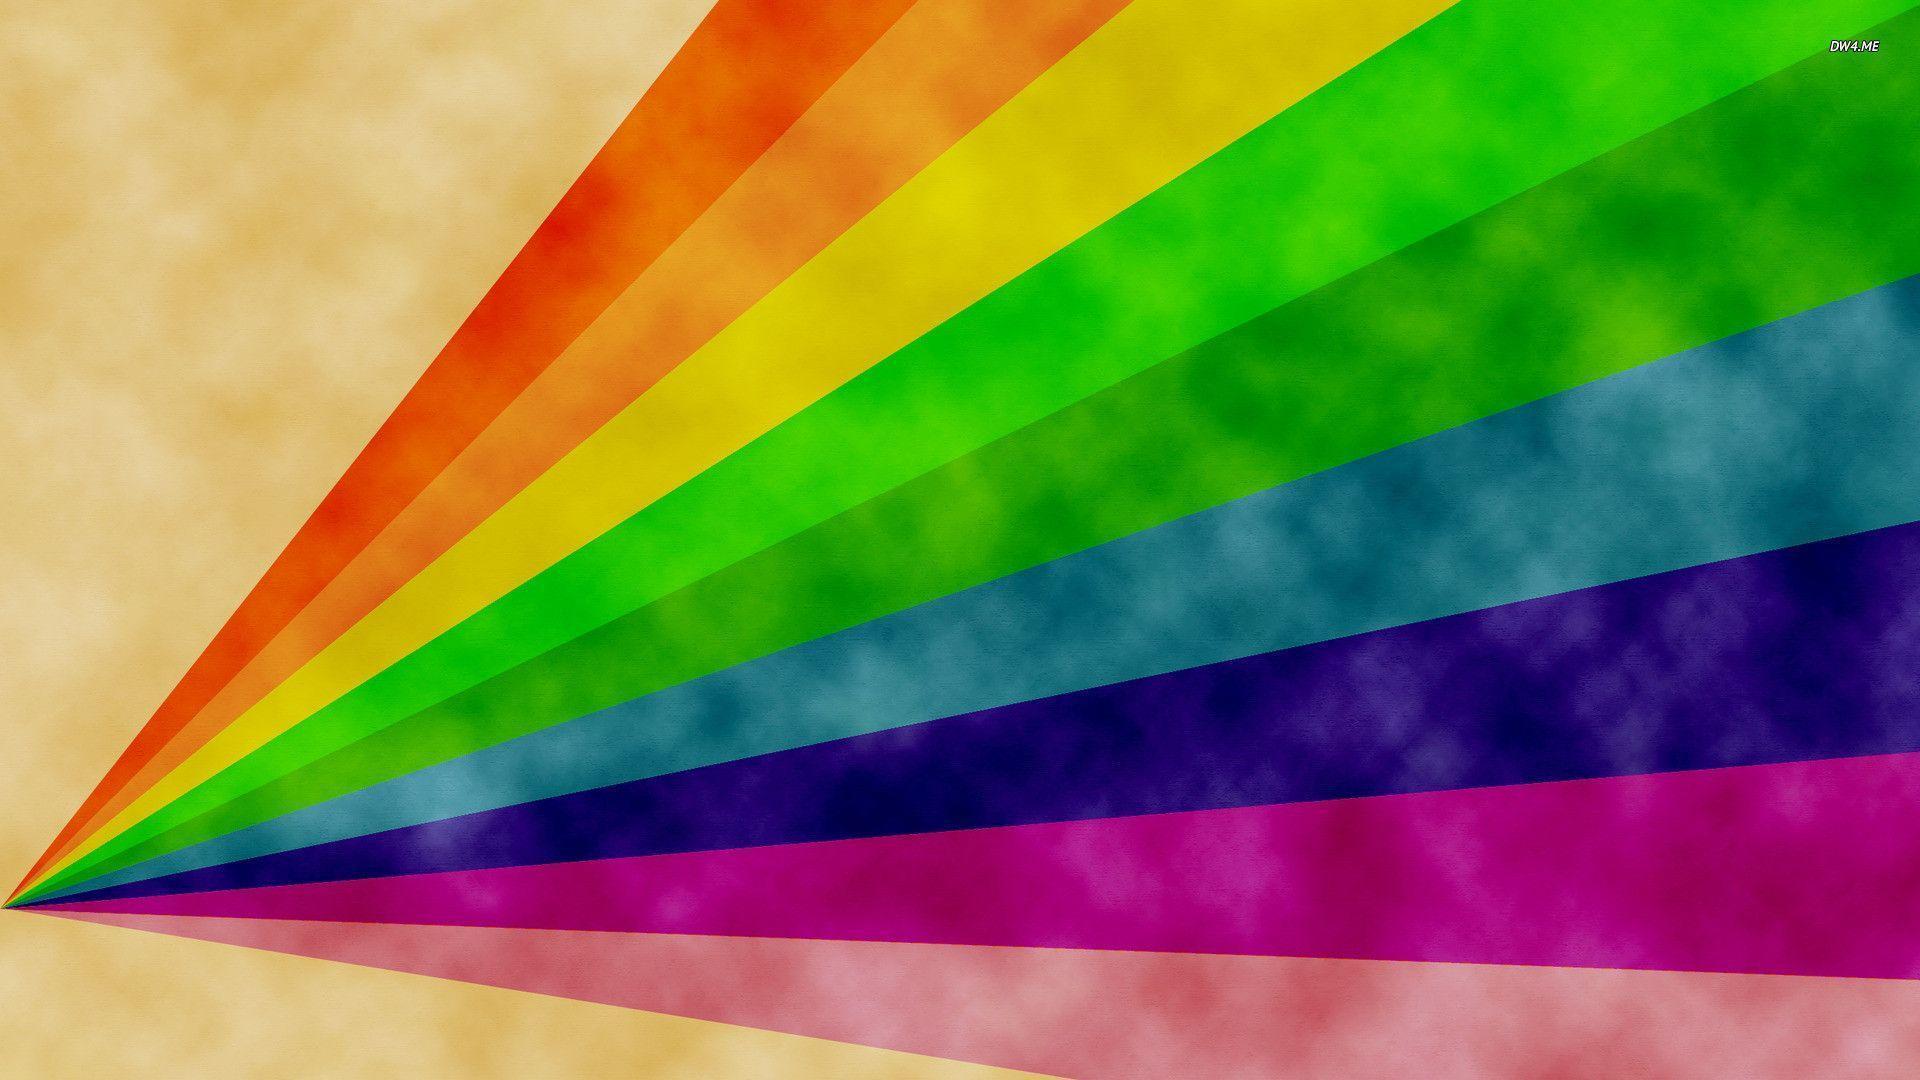 Wallpapers Rainbow